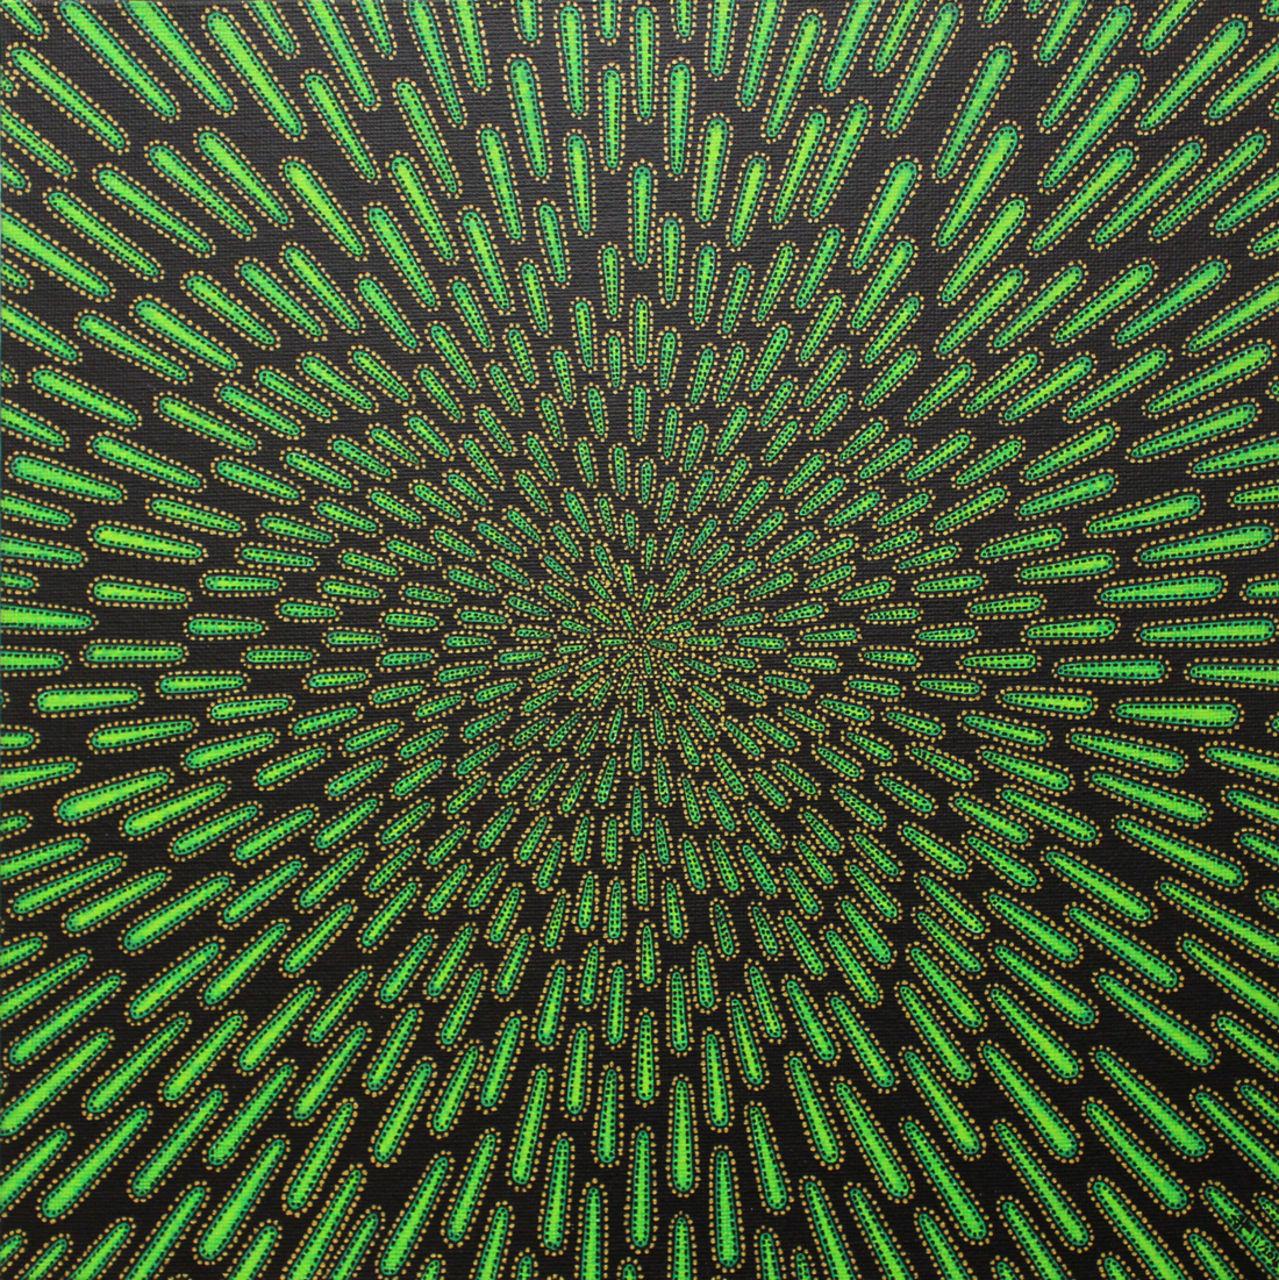 Jonathan-Pradillon Particule verte